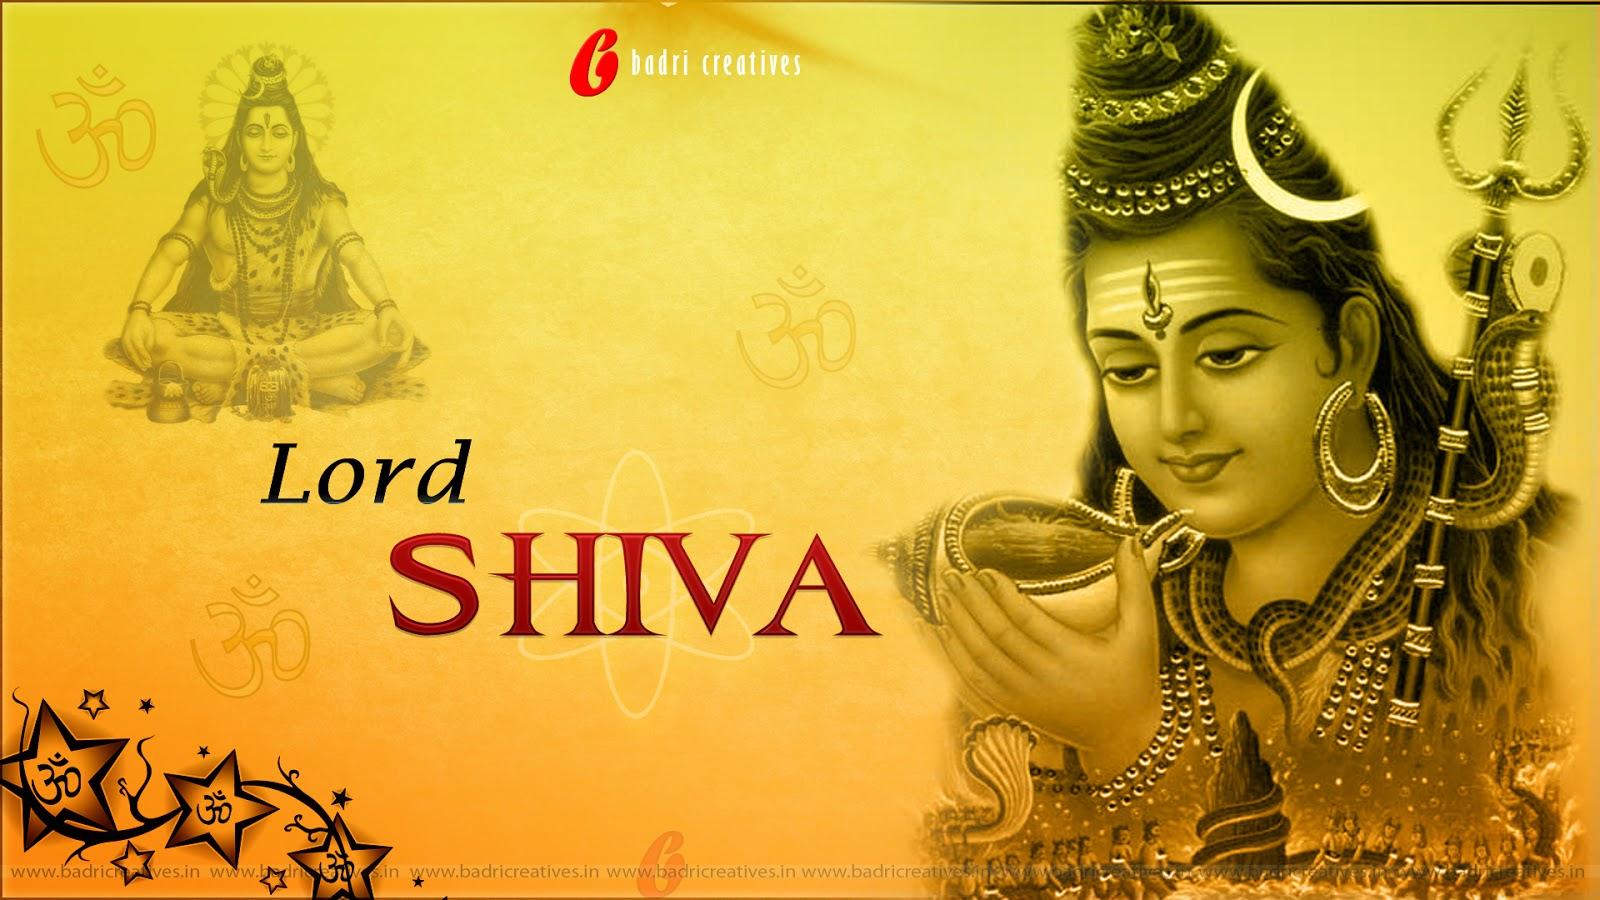 49 Lord Shiva Hd Wallpapers On Wallpapersafari